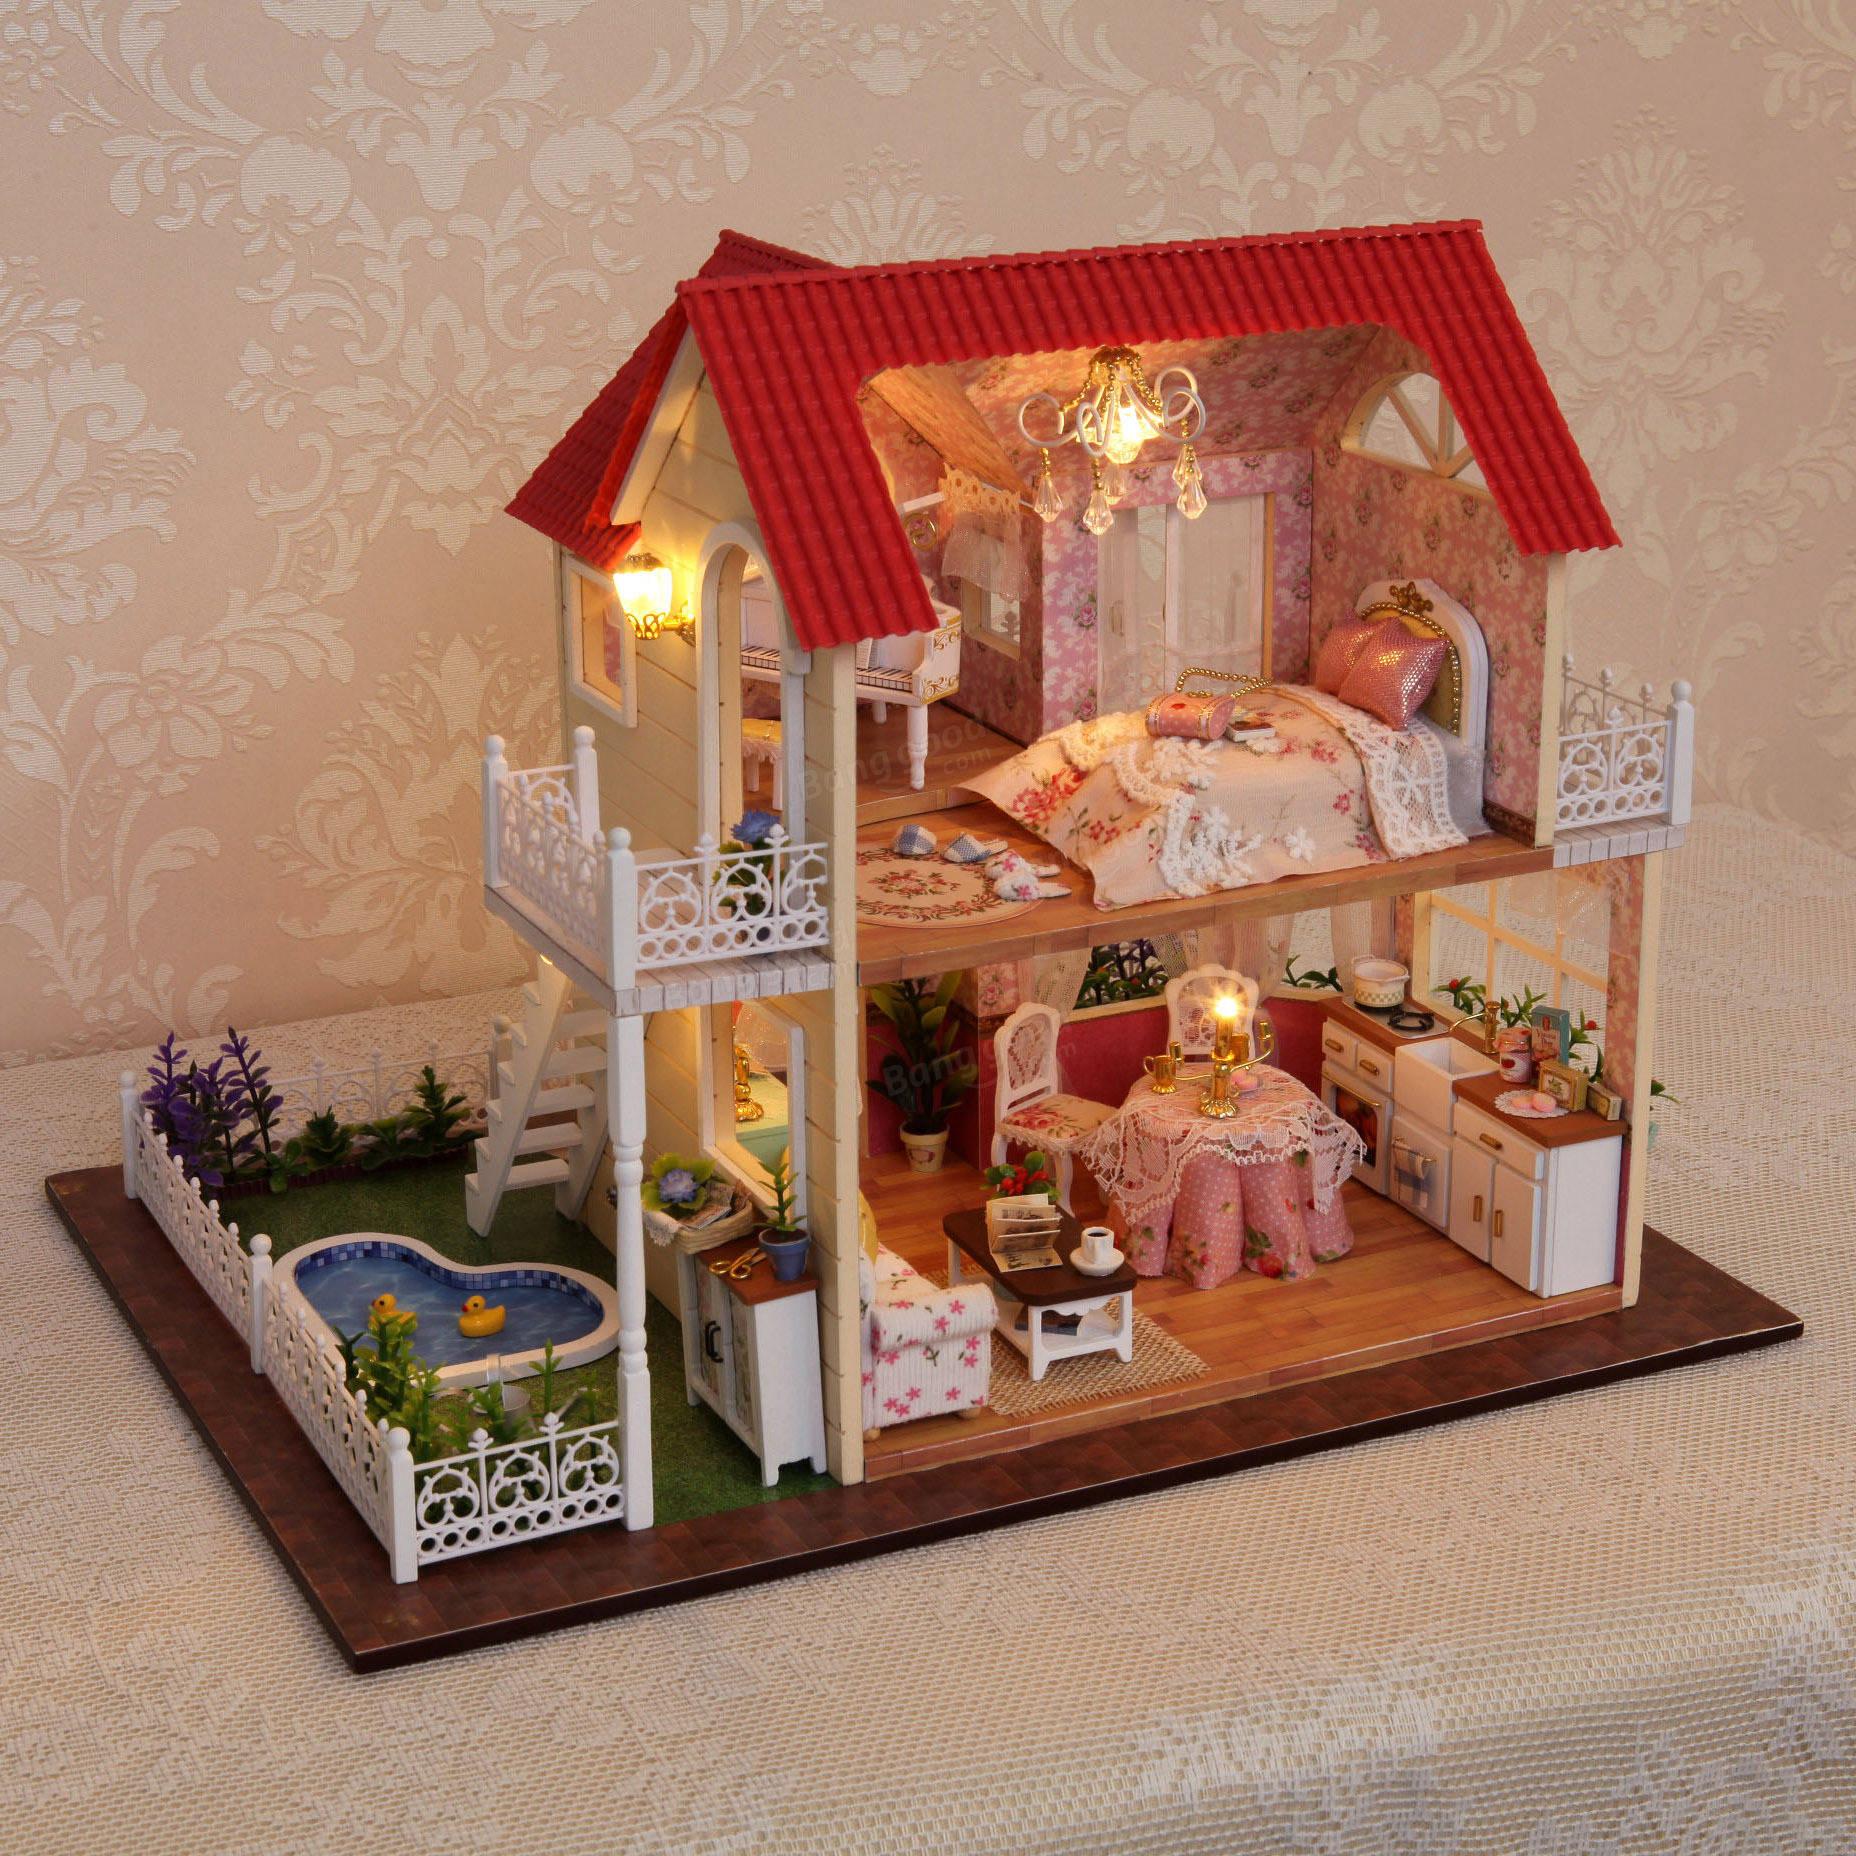 Cuteroom diy wooden dollhouse princess room handmade for Handmade decoration